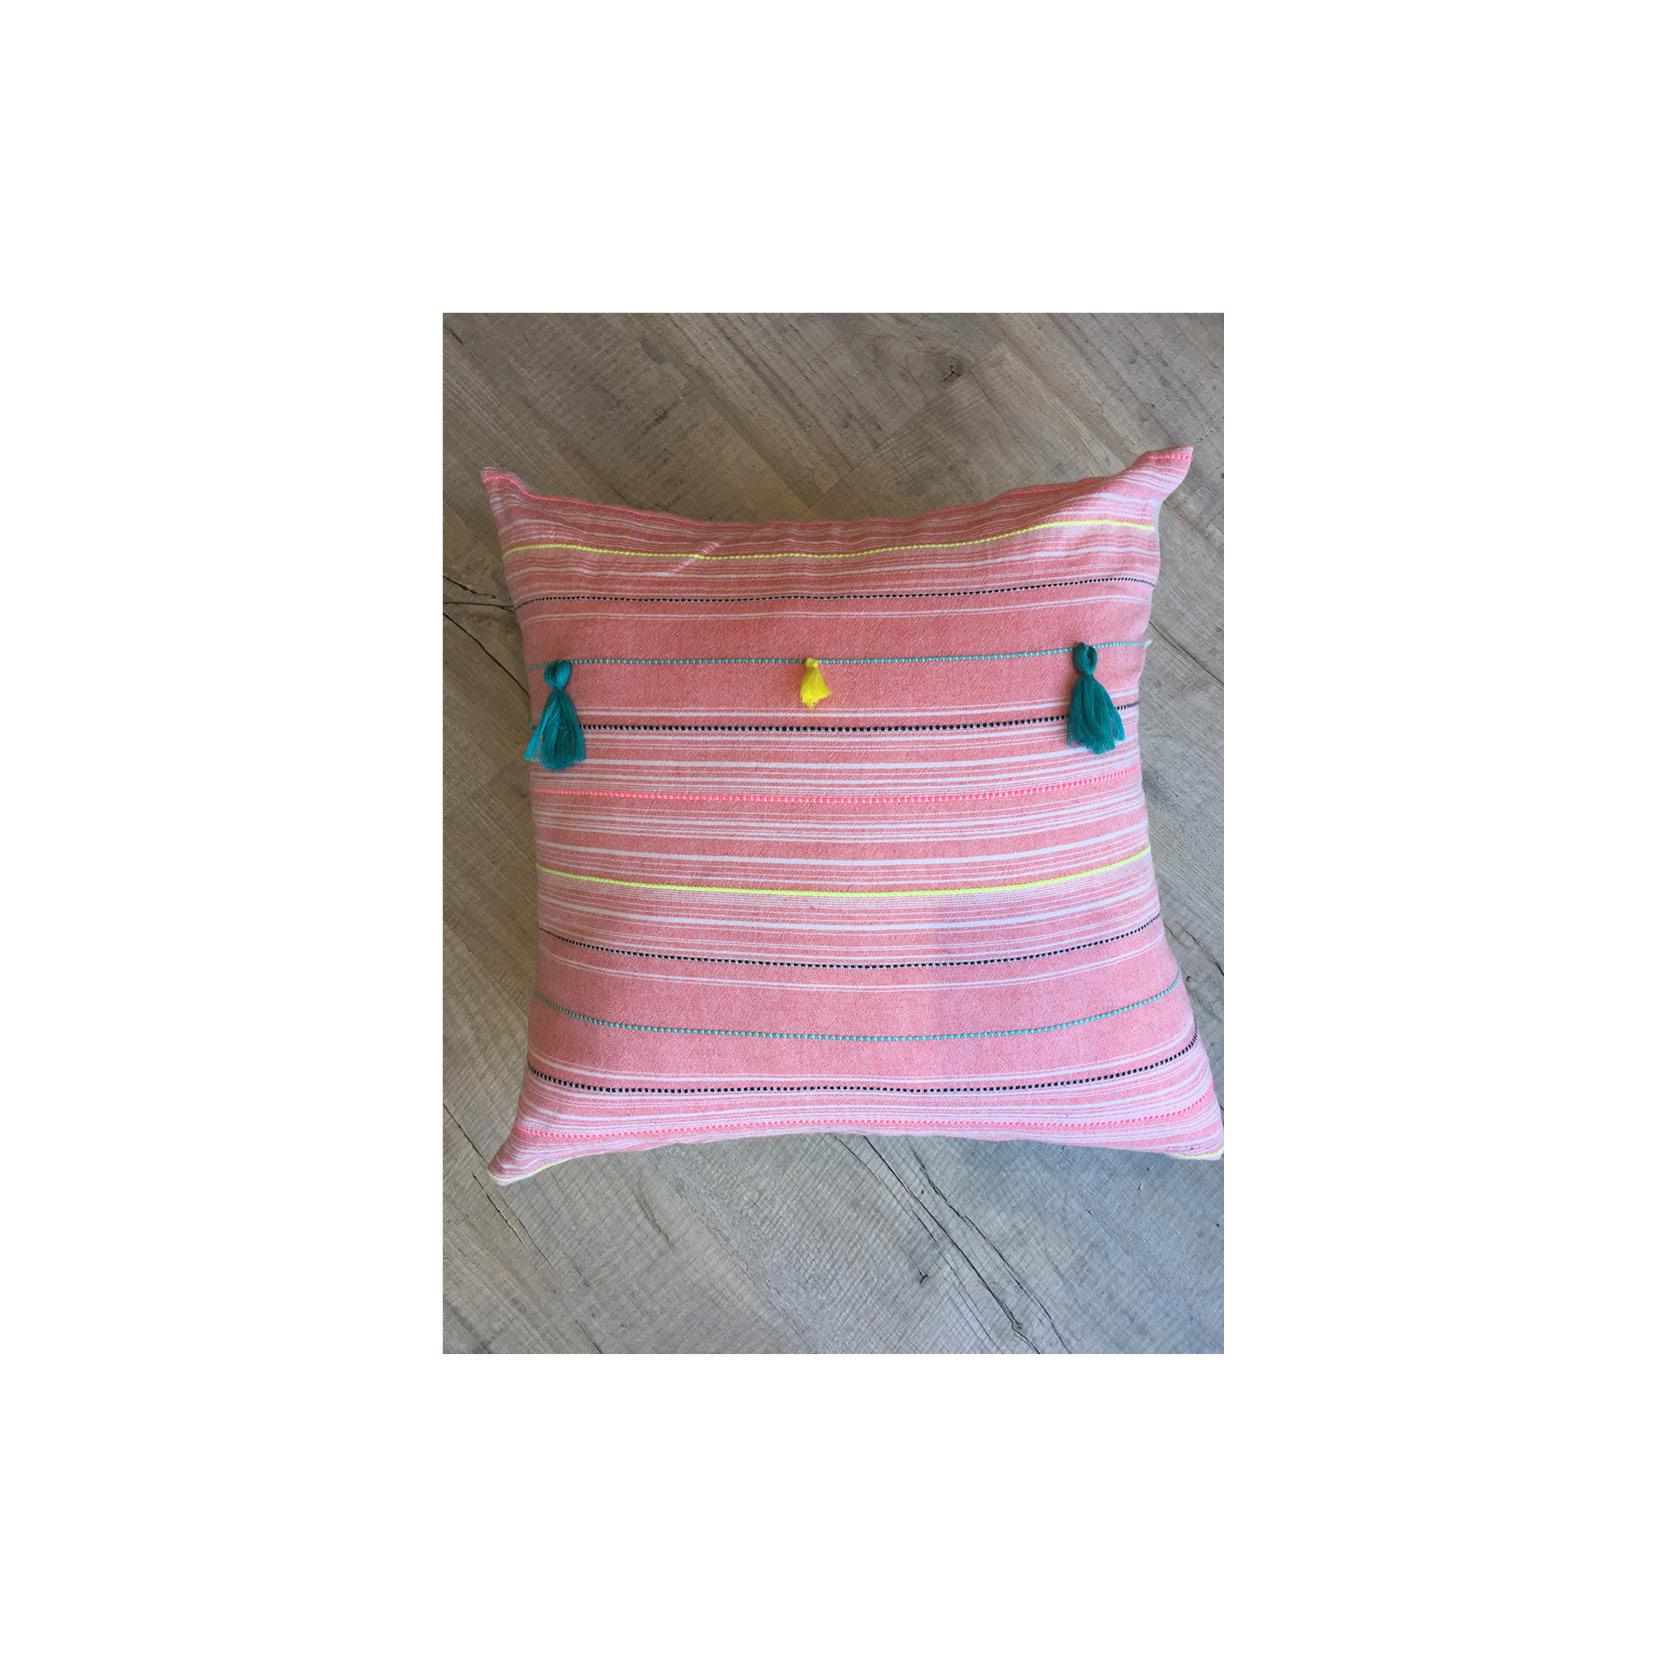 Pebble & Stripe - Square pink tassle cushion